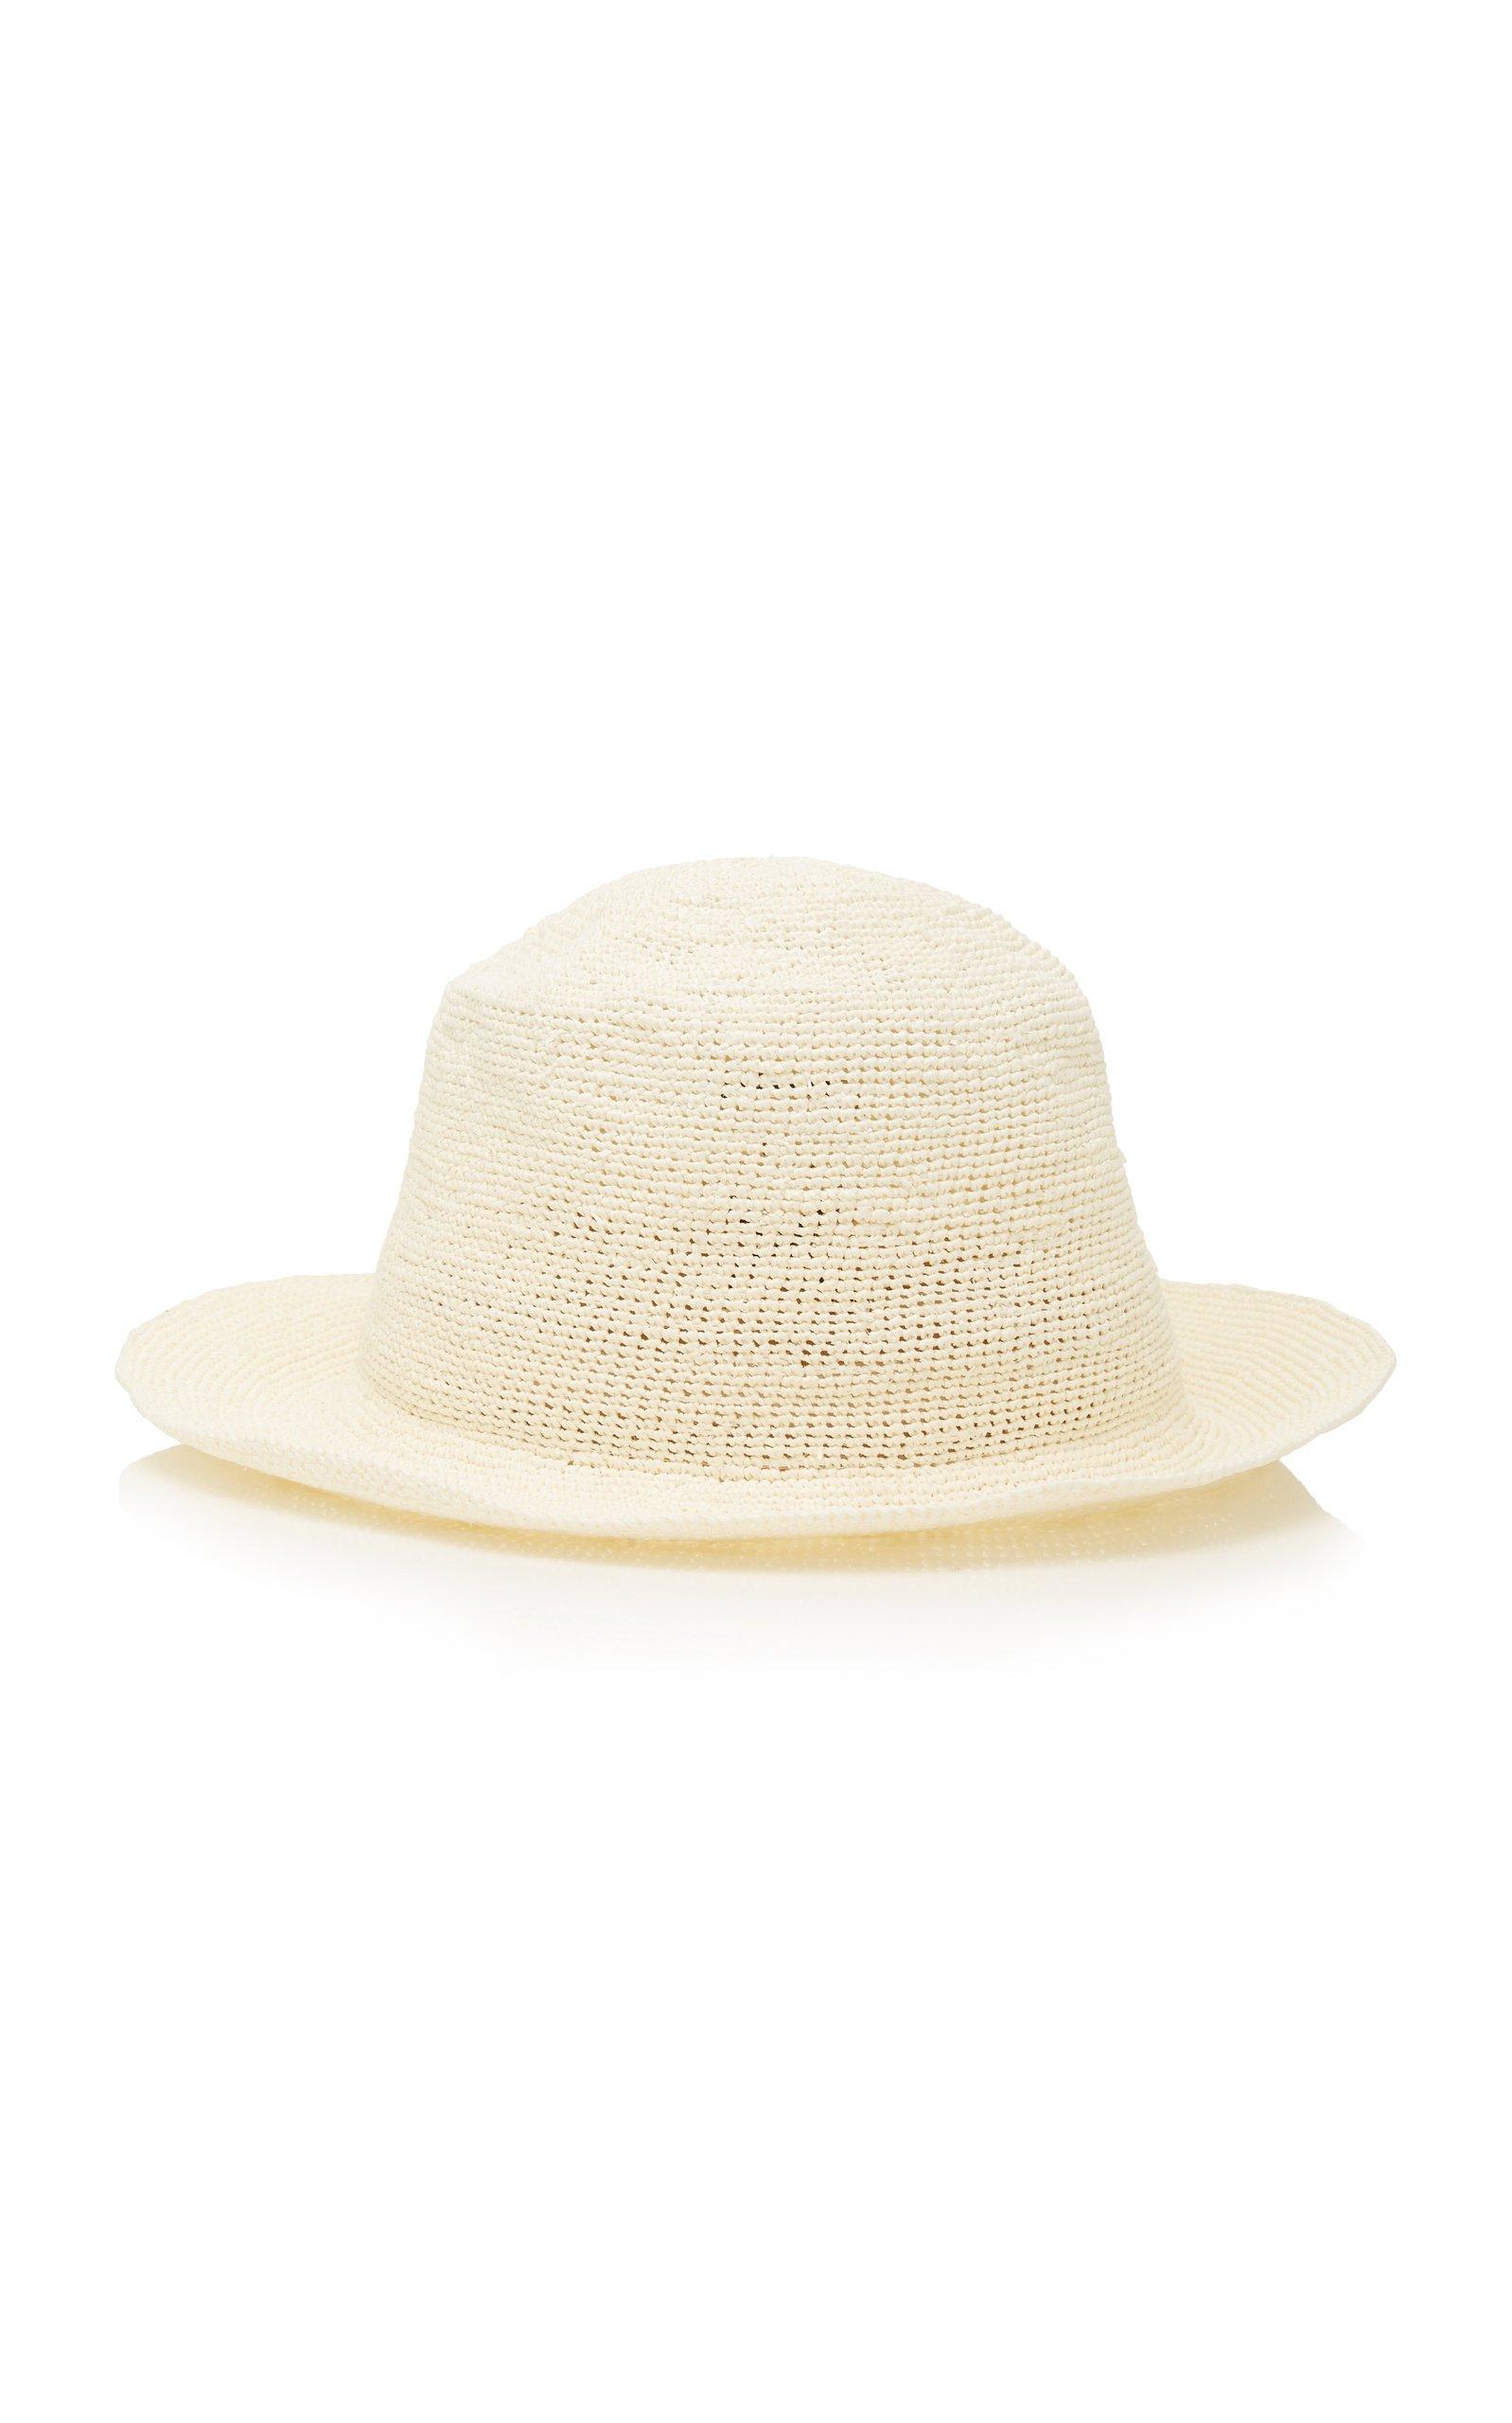 Sensi Studio Hippie Straw Hat